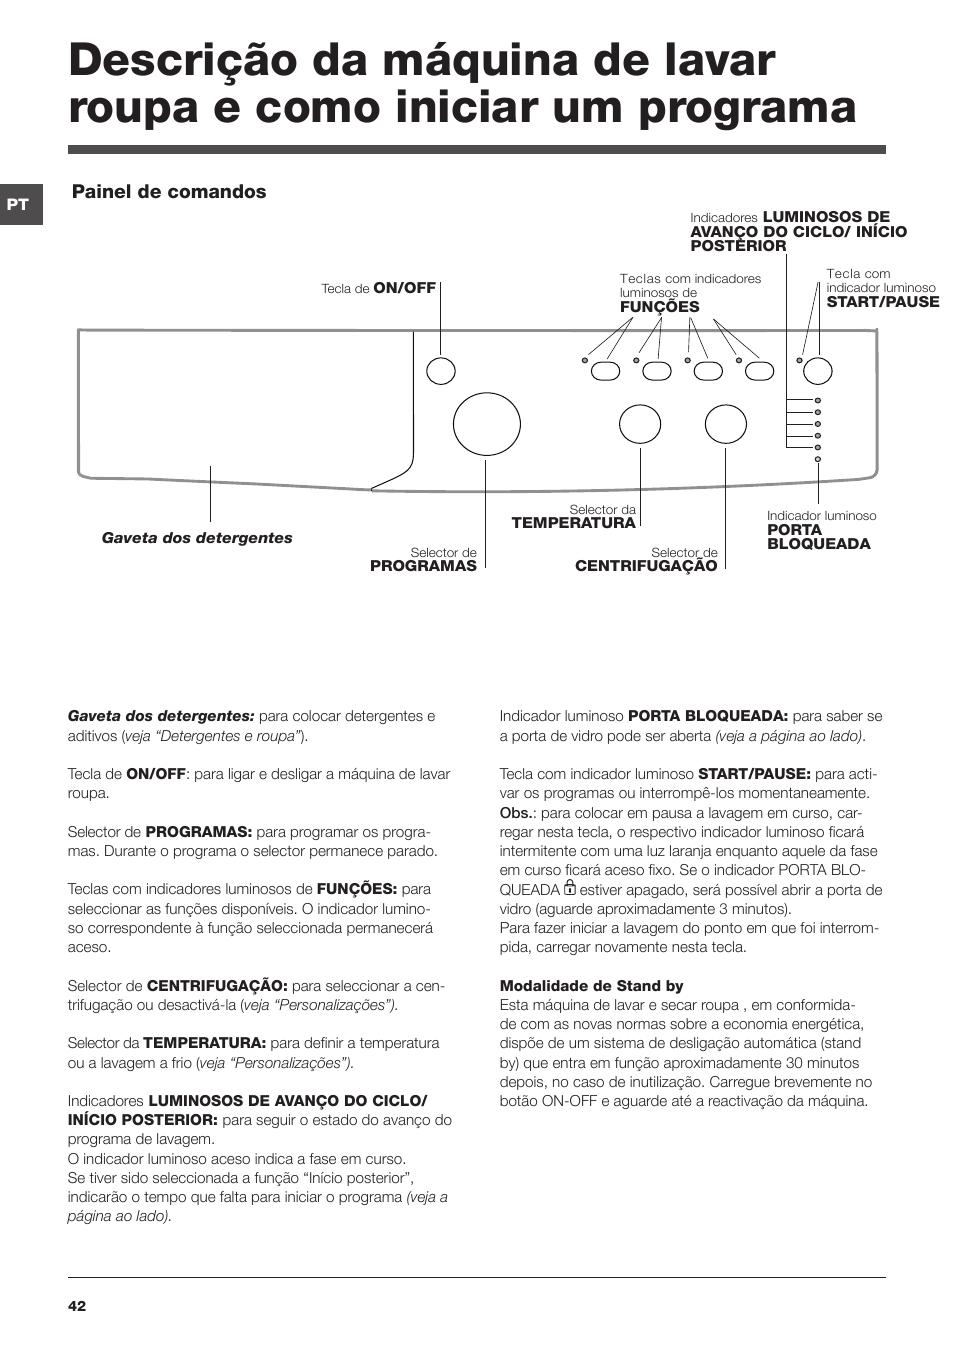 indesit iwc 61051 eu user manual page 42 72 original mode rh manualsdir com indesit iwc 61051 manuale italiano indesit iwc 61051 manuale italiano